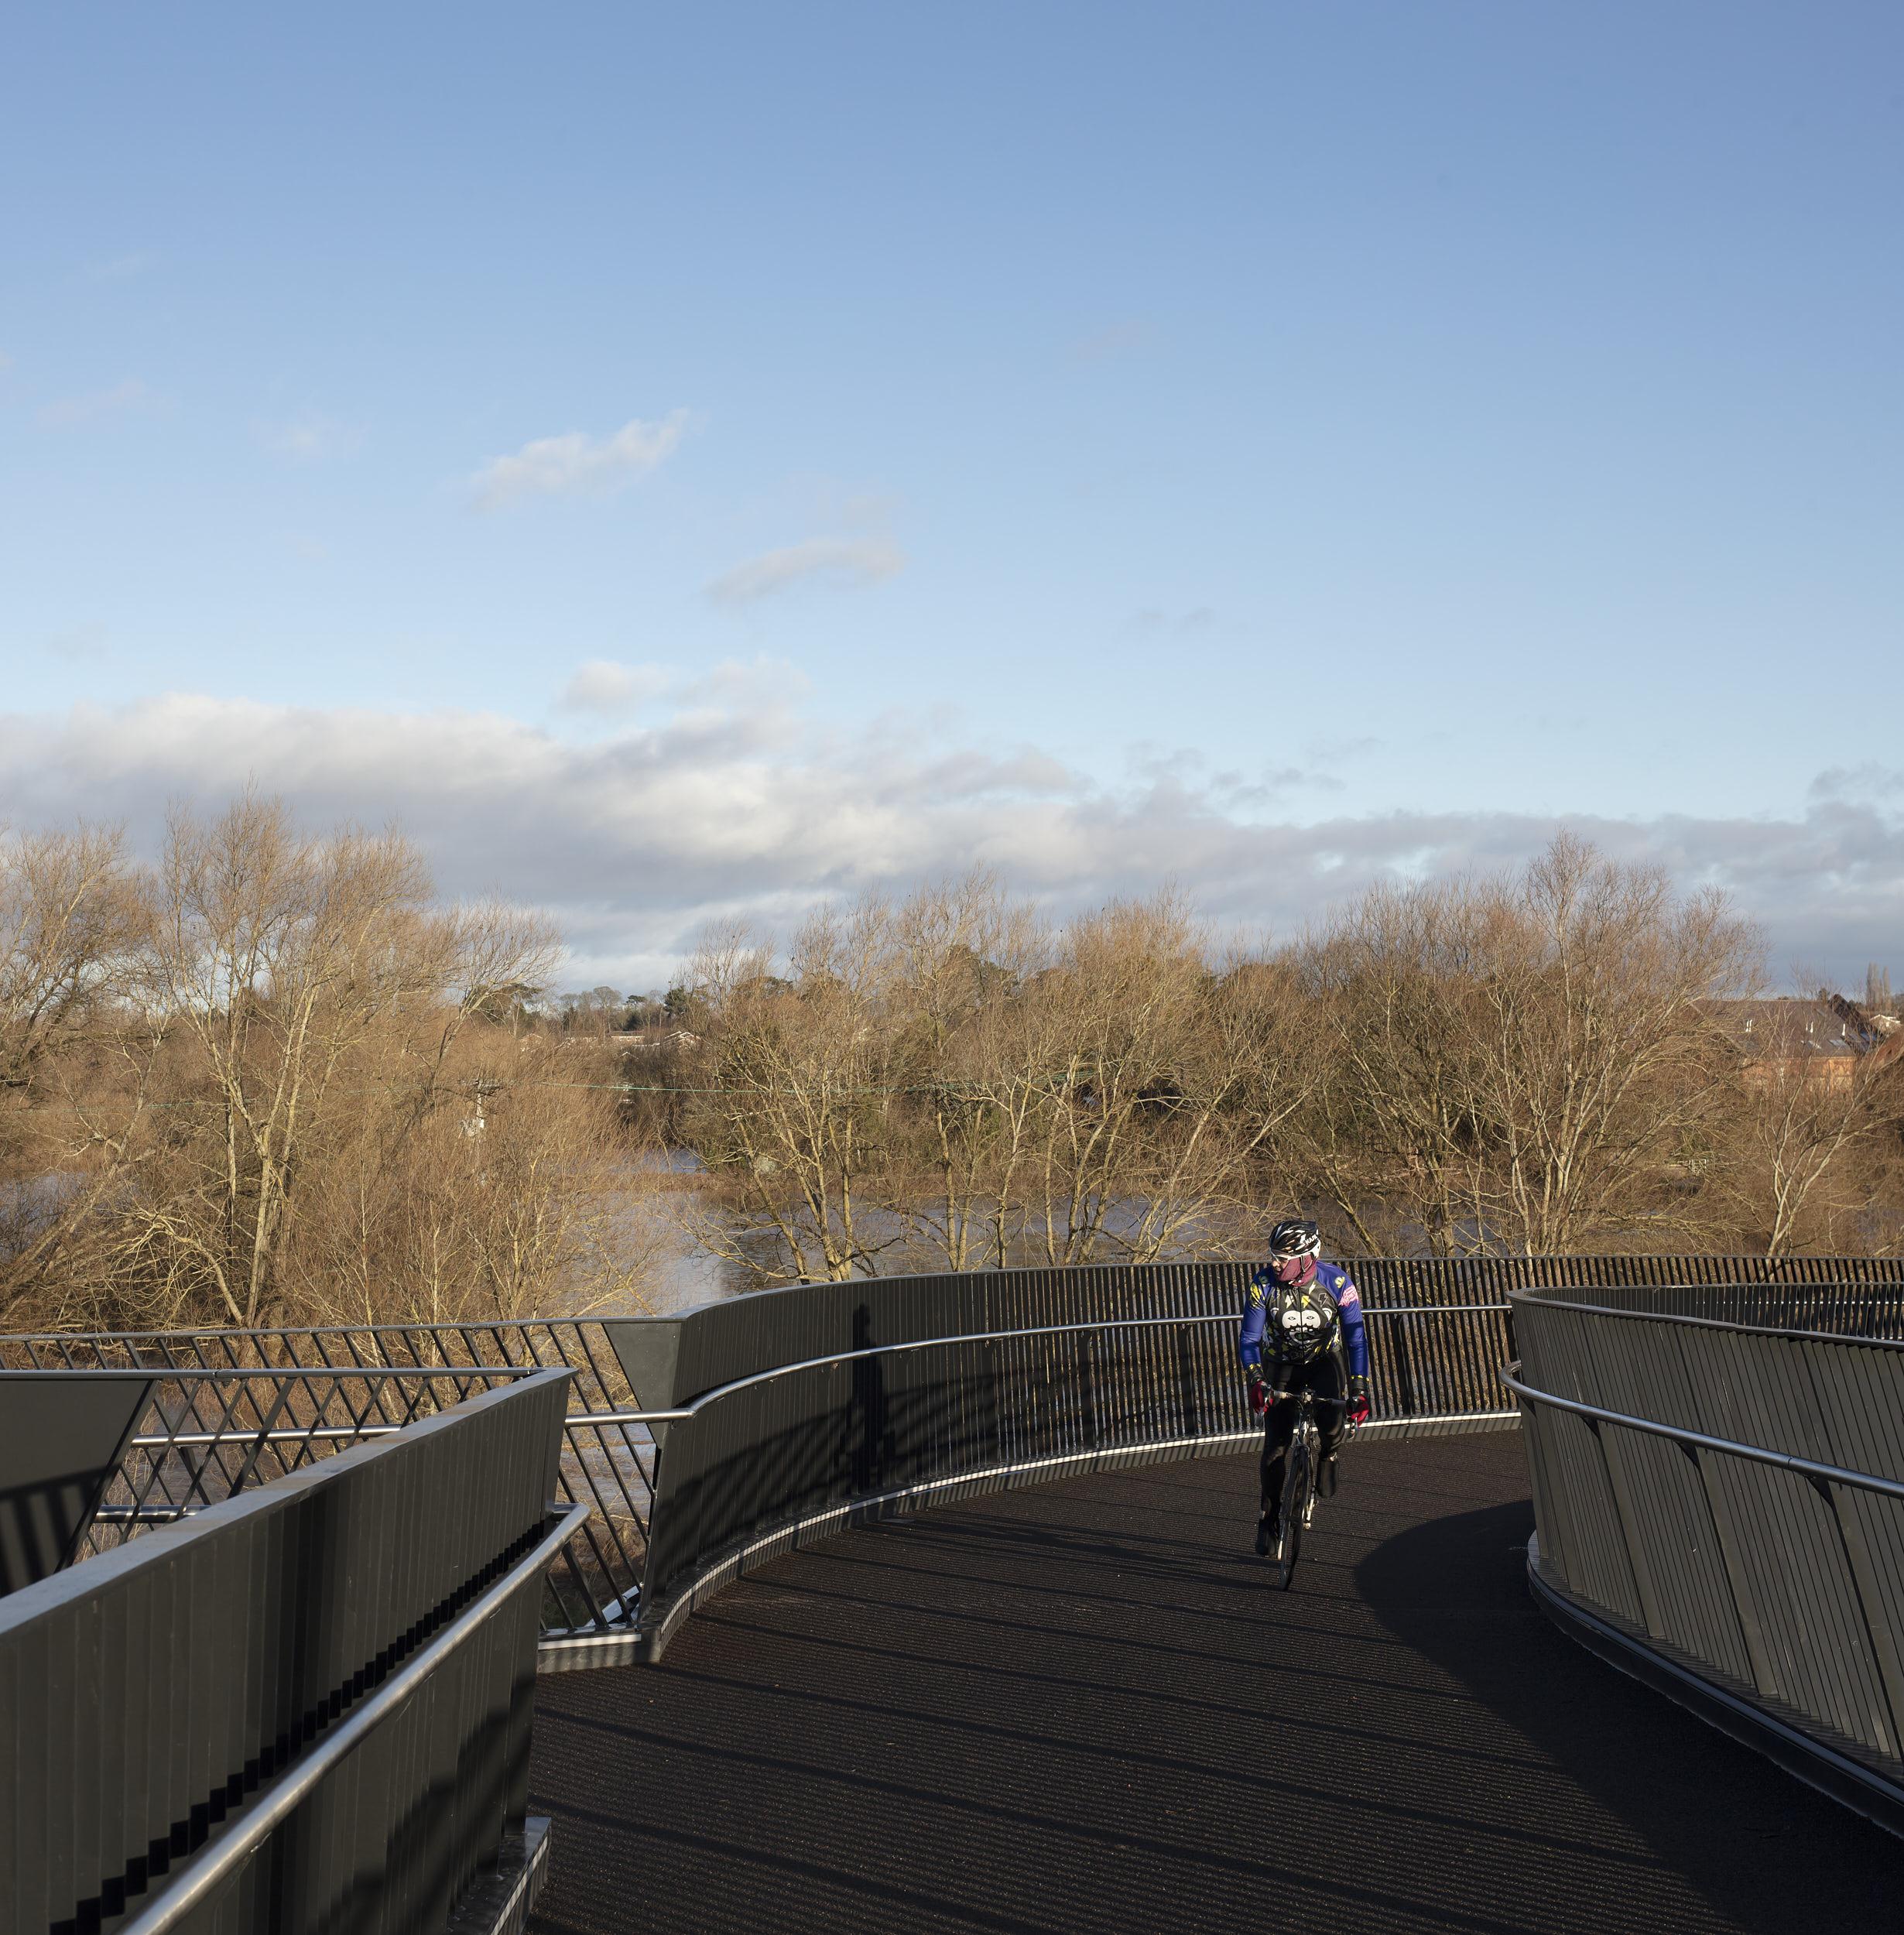 The bridge provides beautiful views of the surrounding area.